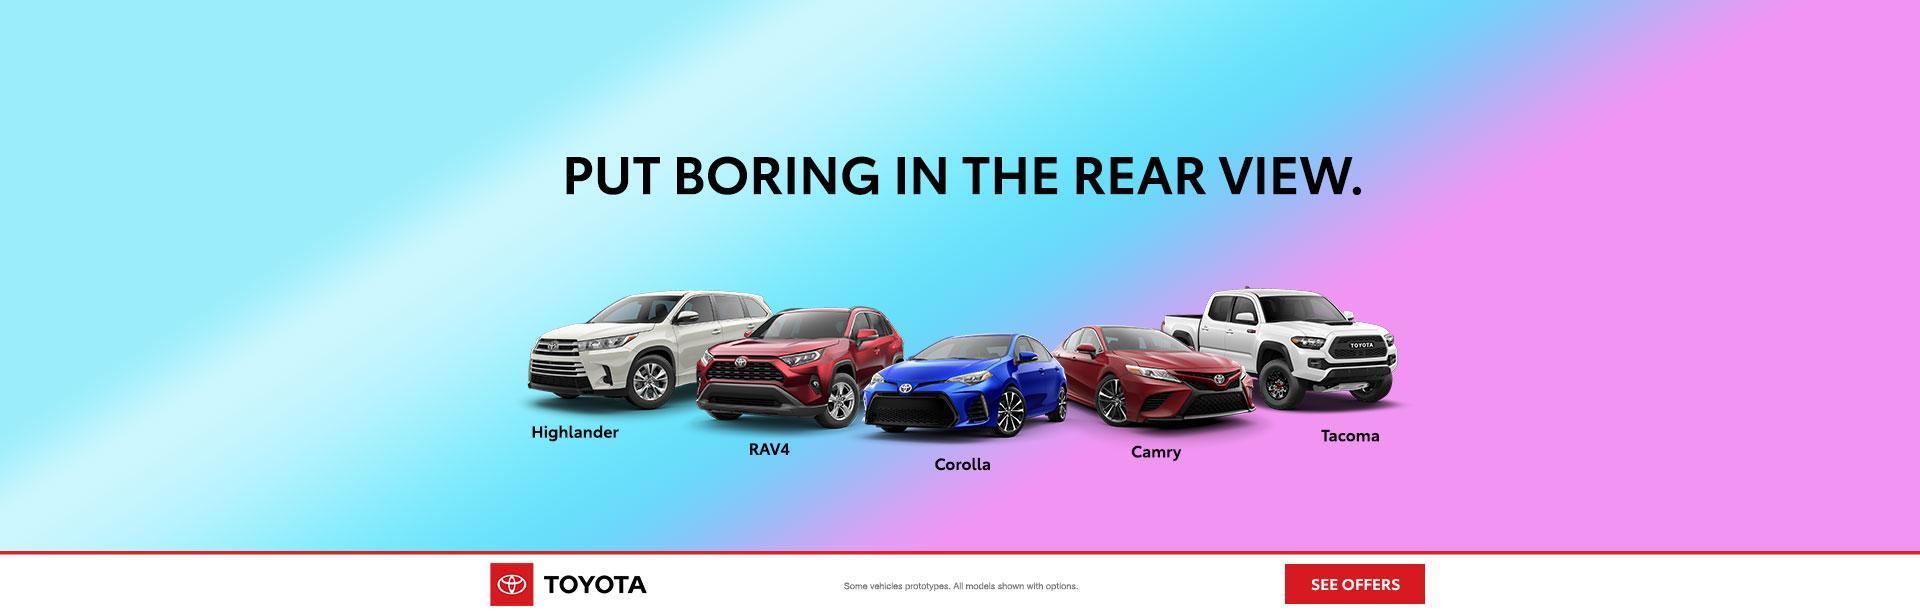 Pedersen Toyota Offers